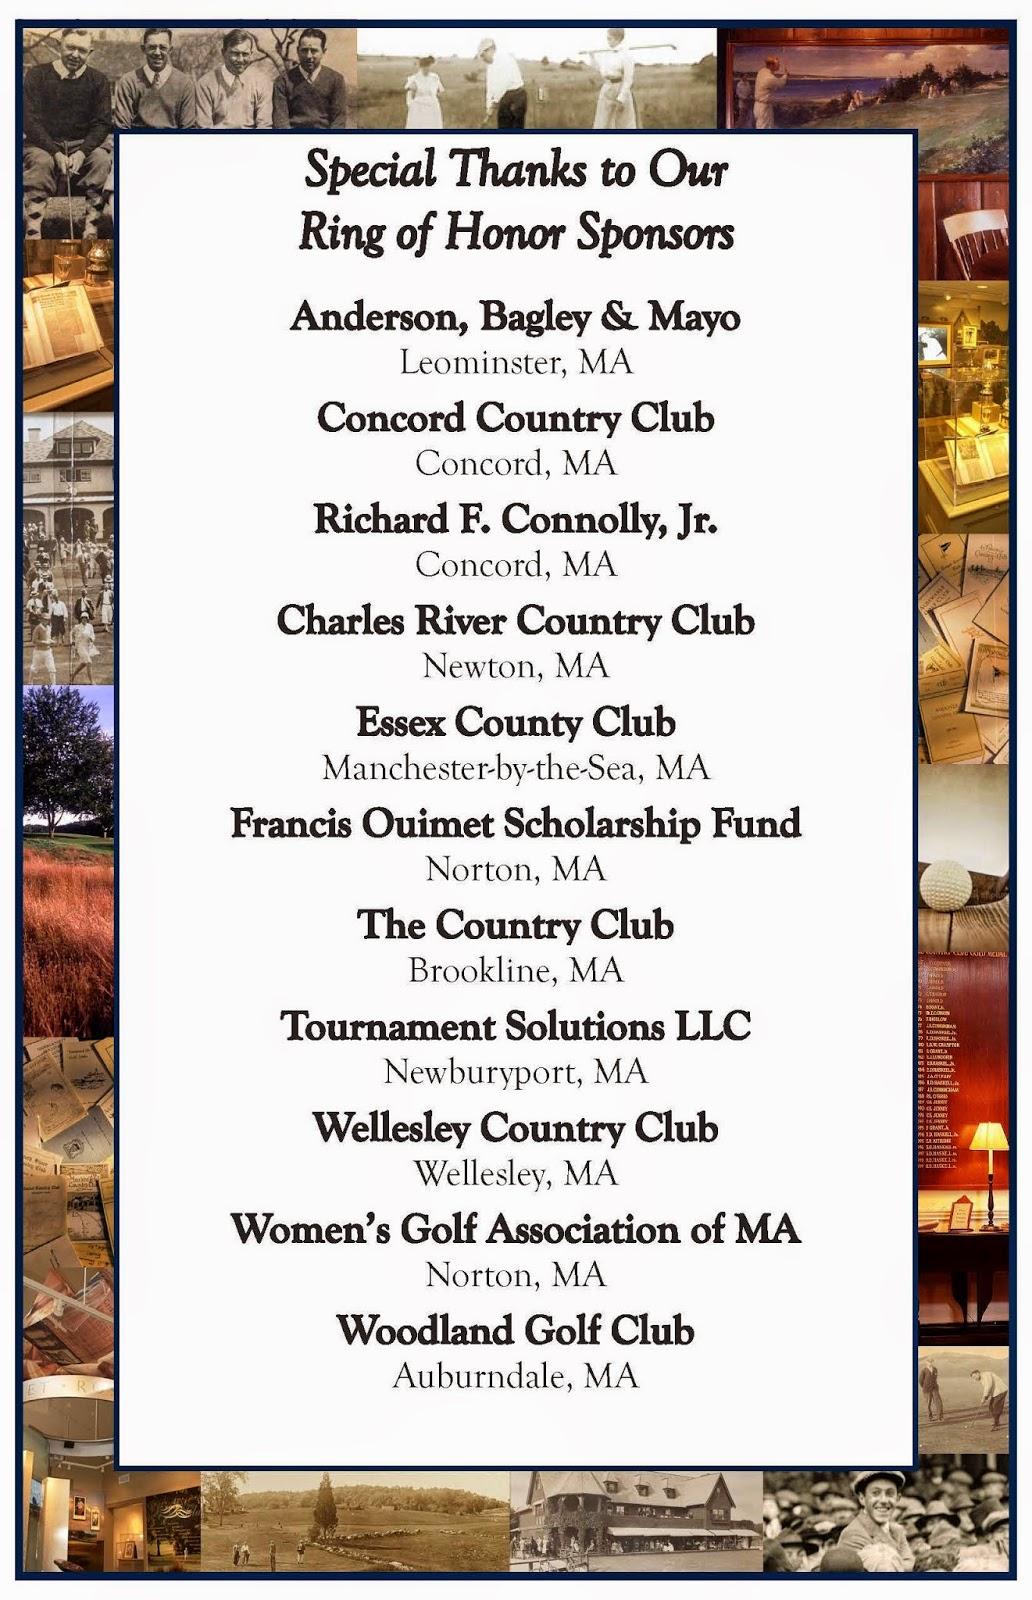 Massachusetts golf association october 2014 rohg stopboris Image collections